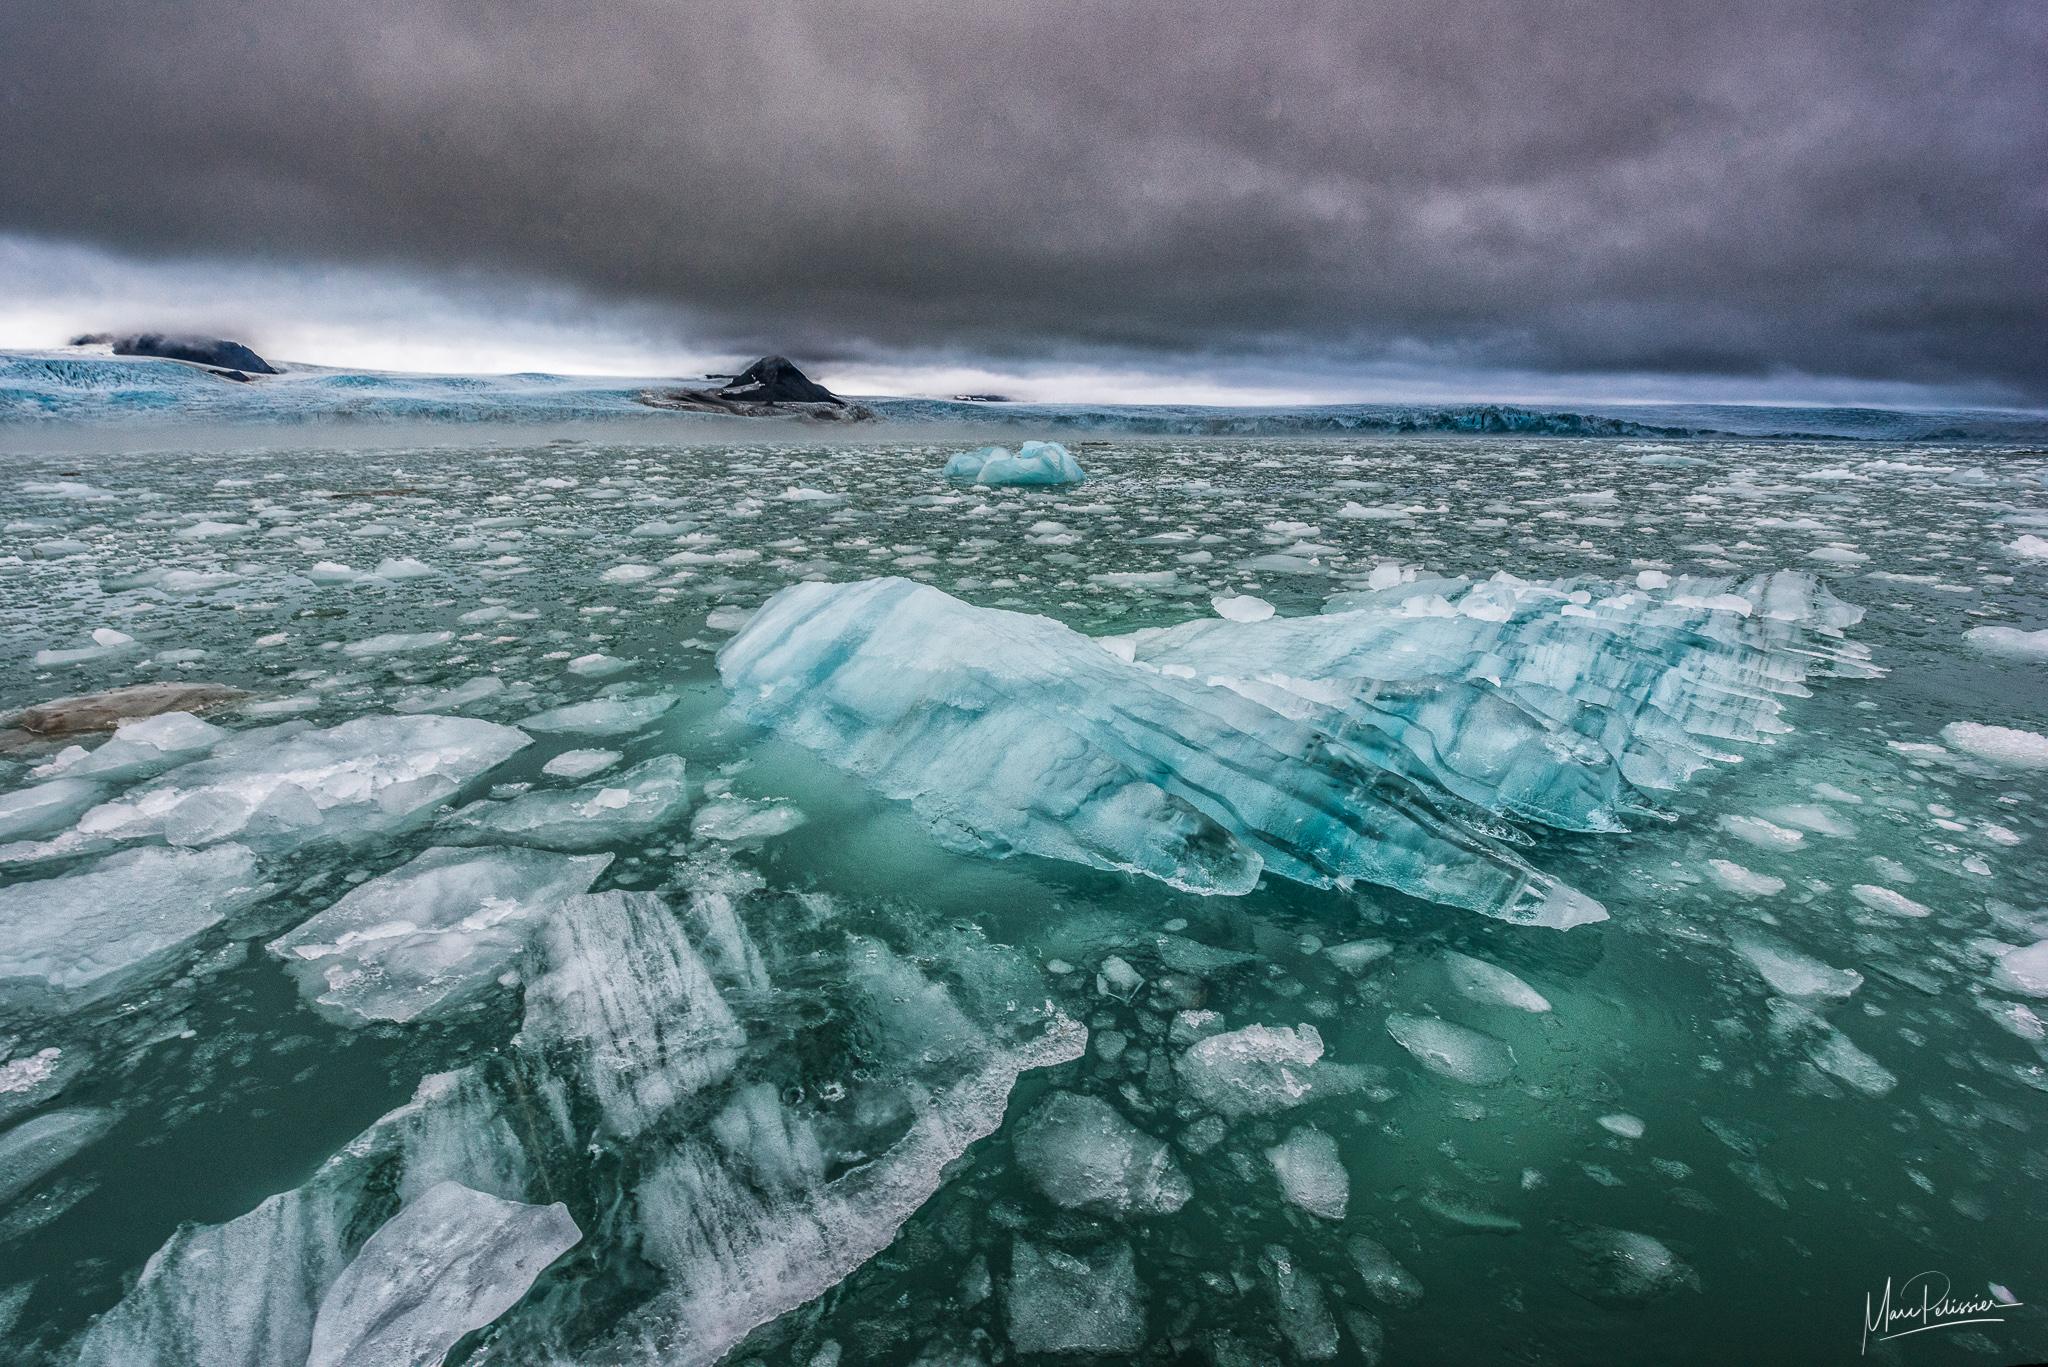 The ice hand, Svalbard & Jan Mayen Islands